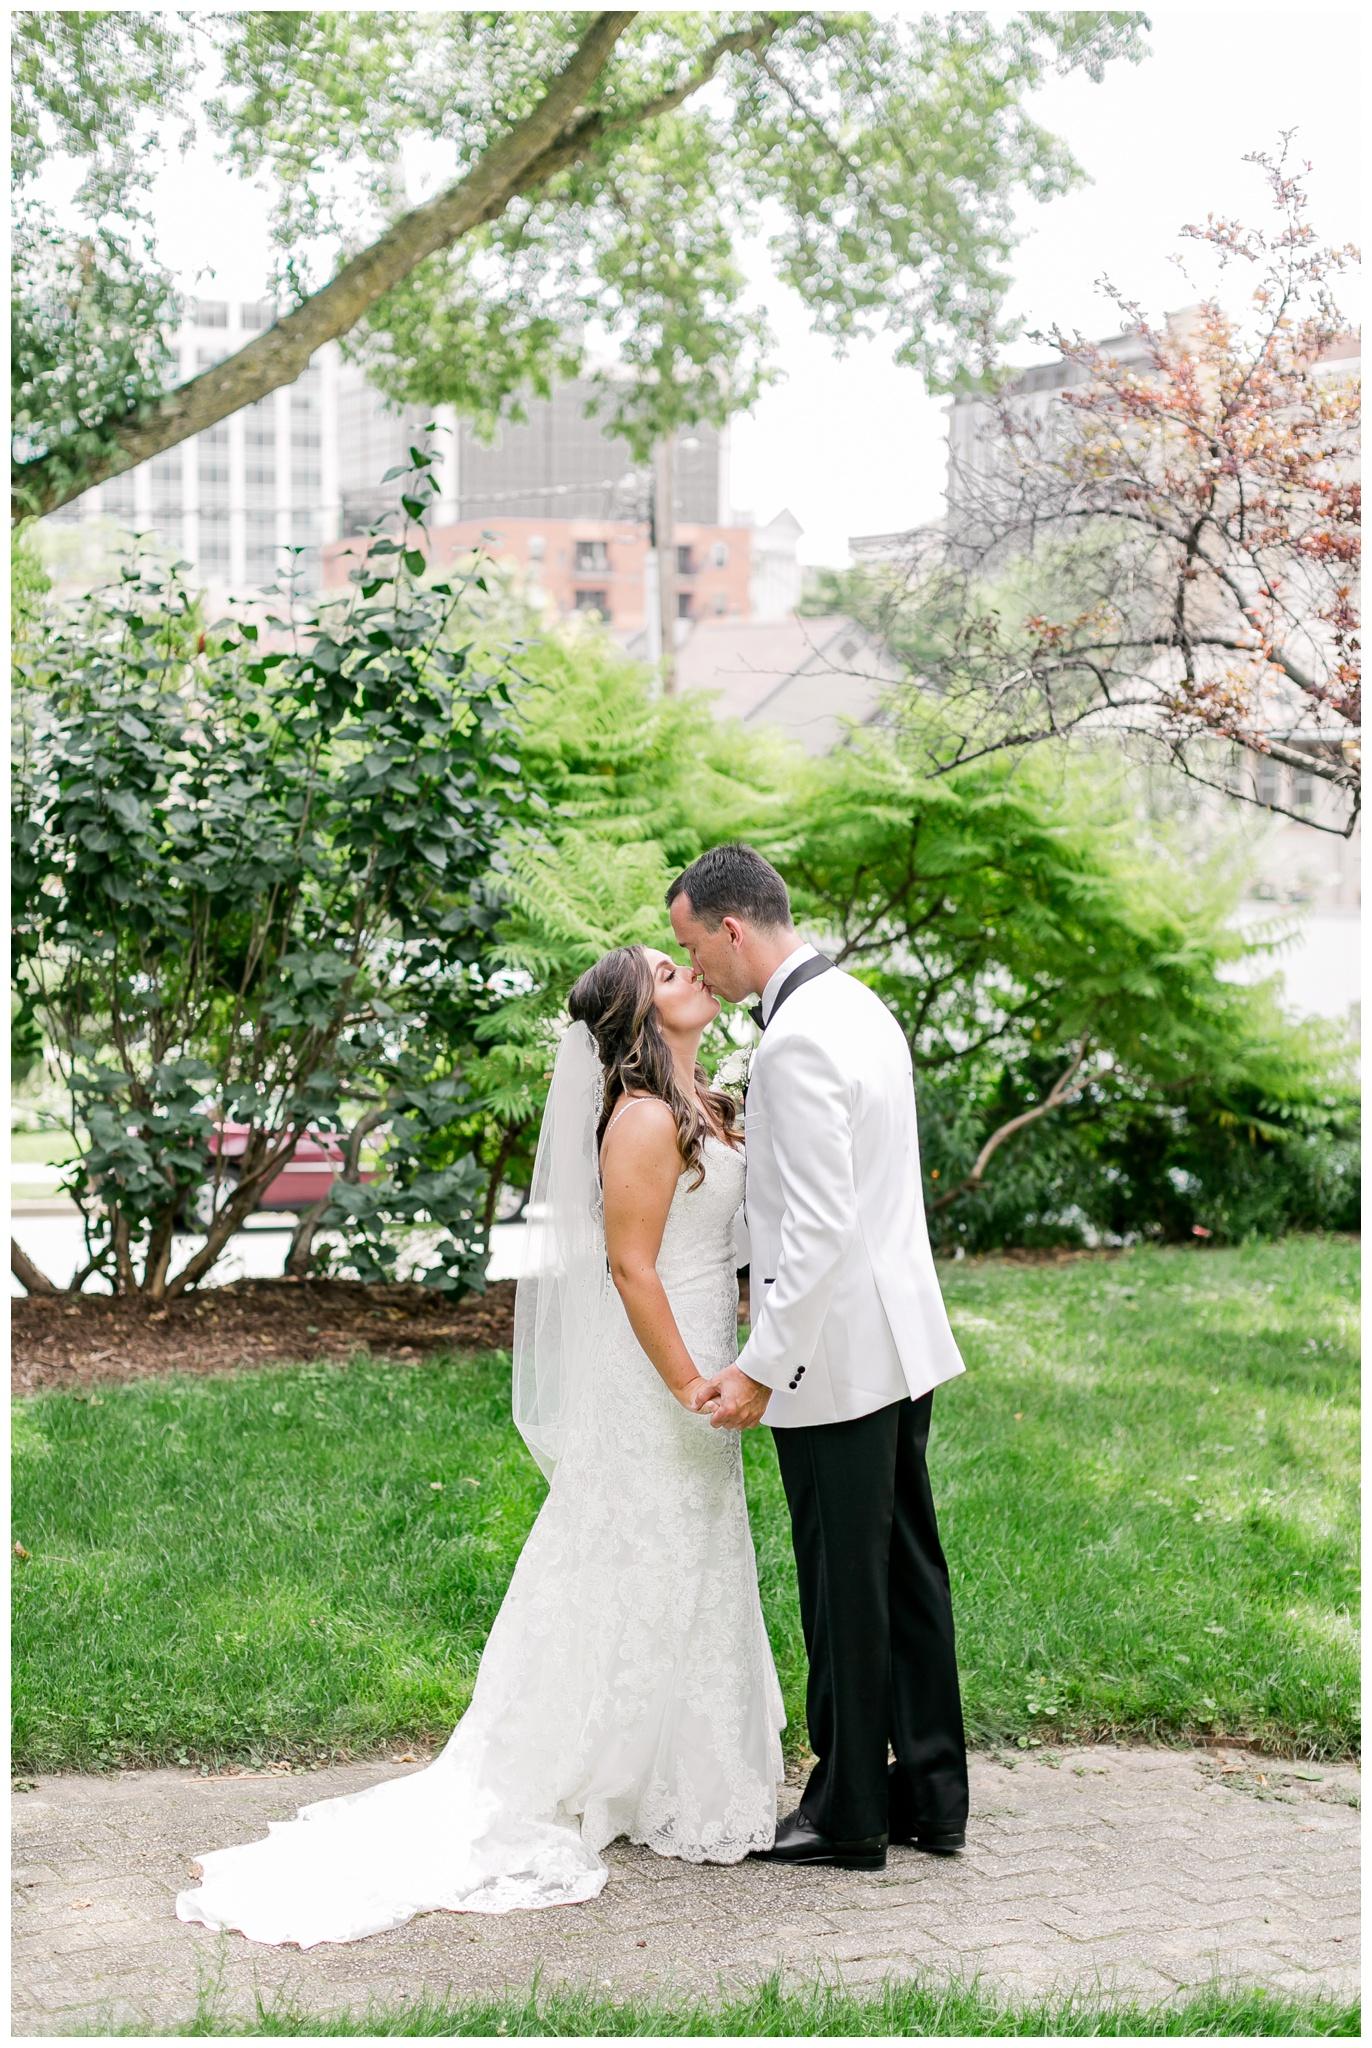 UW_Memorial_Union_wedding_madison_wisconsin_wedding_photographers_4593.jpg